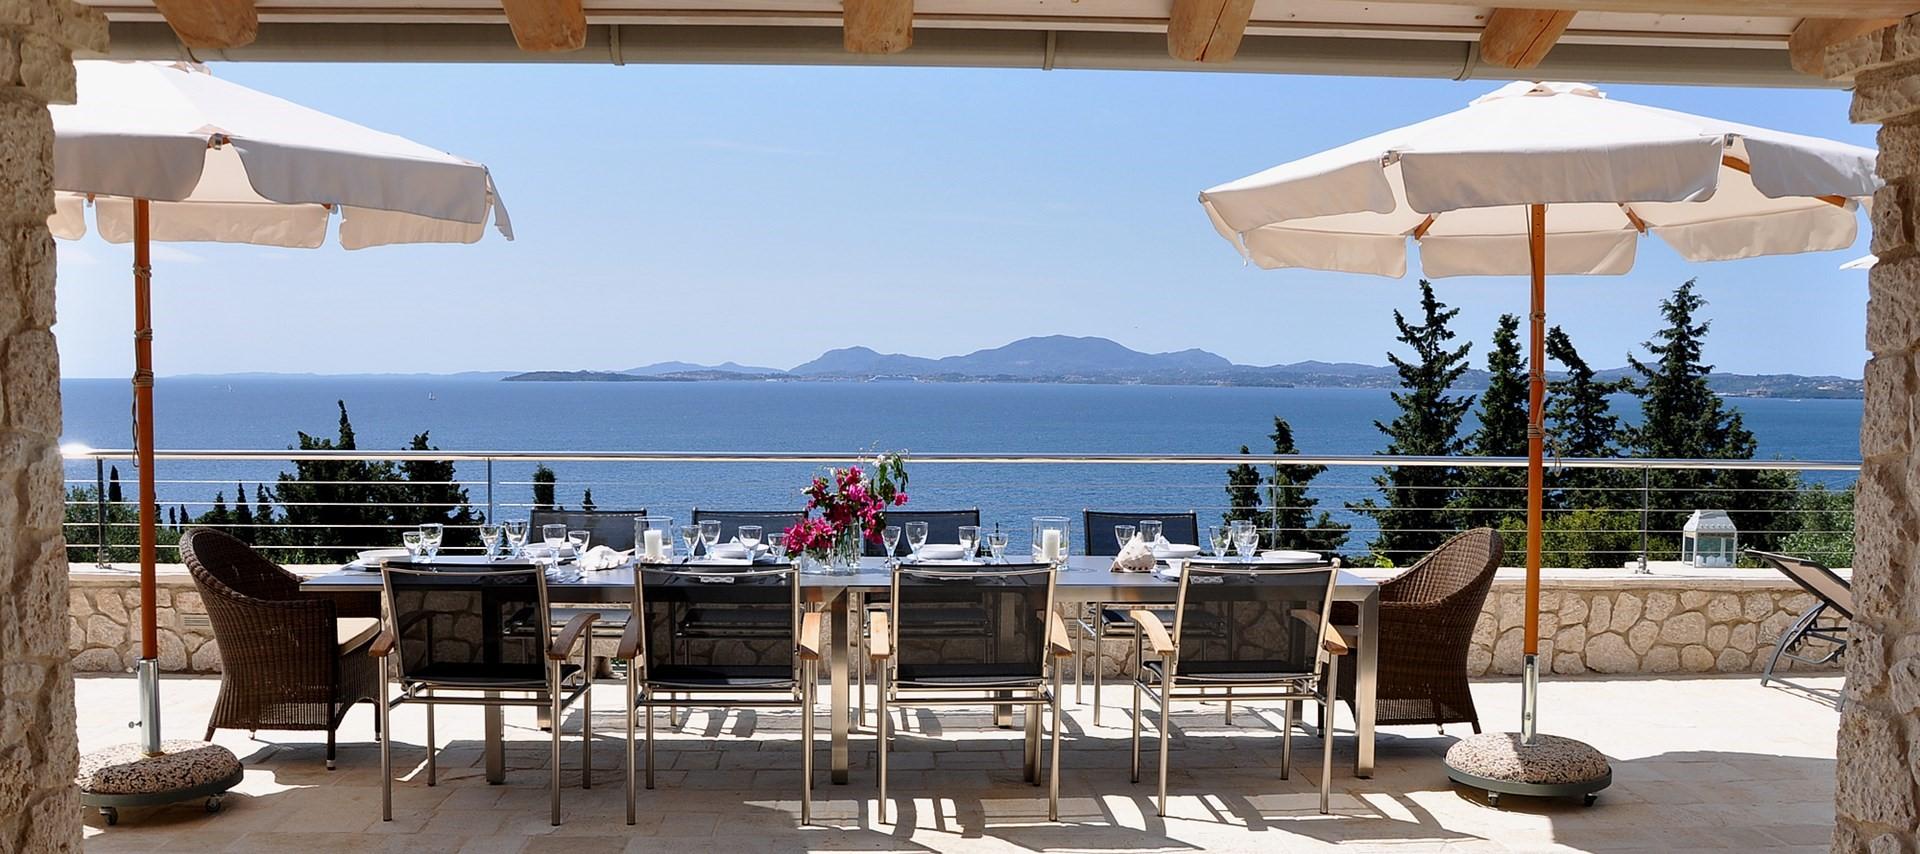 nissaki-house-corfu-dining-terrace